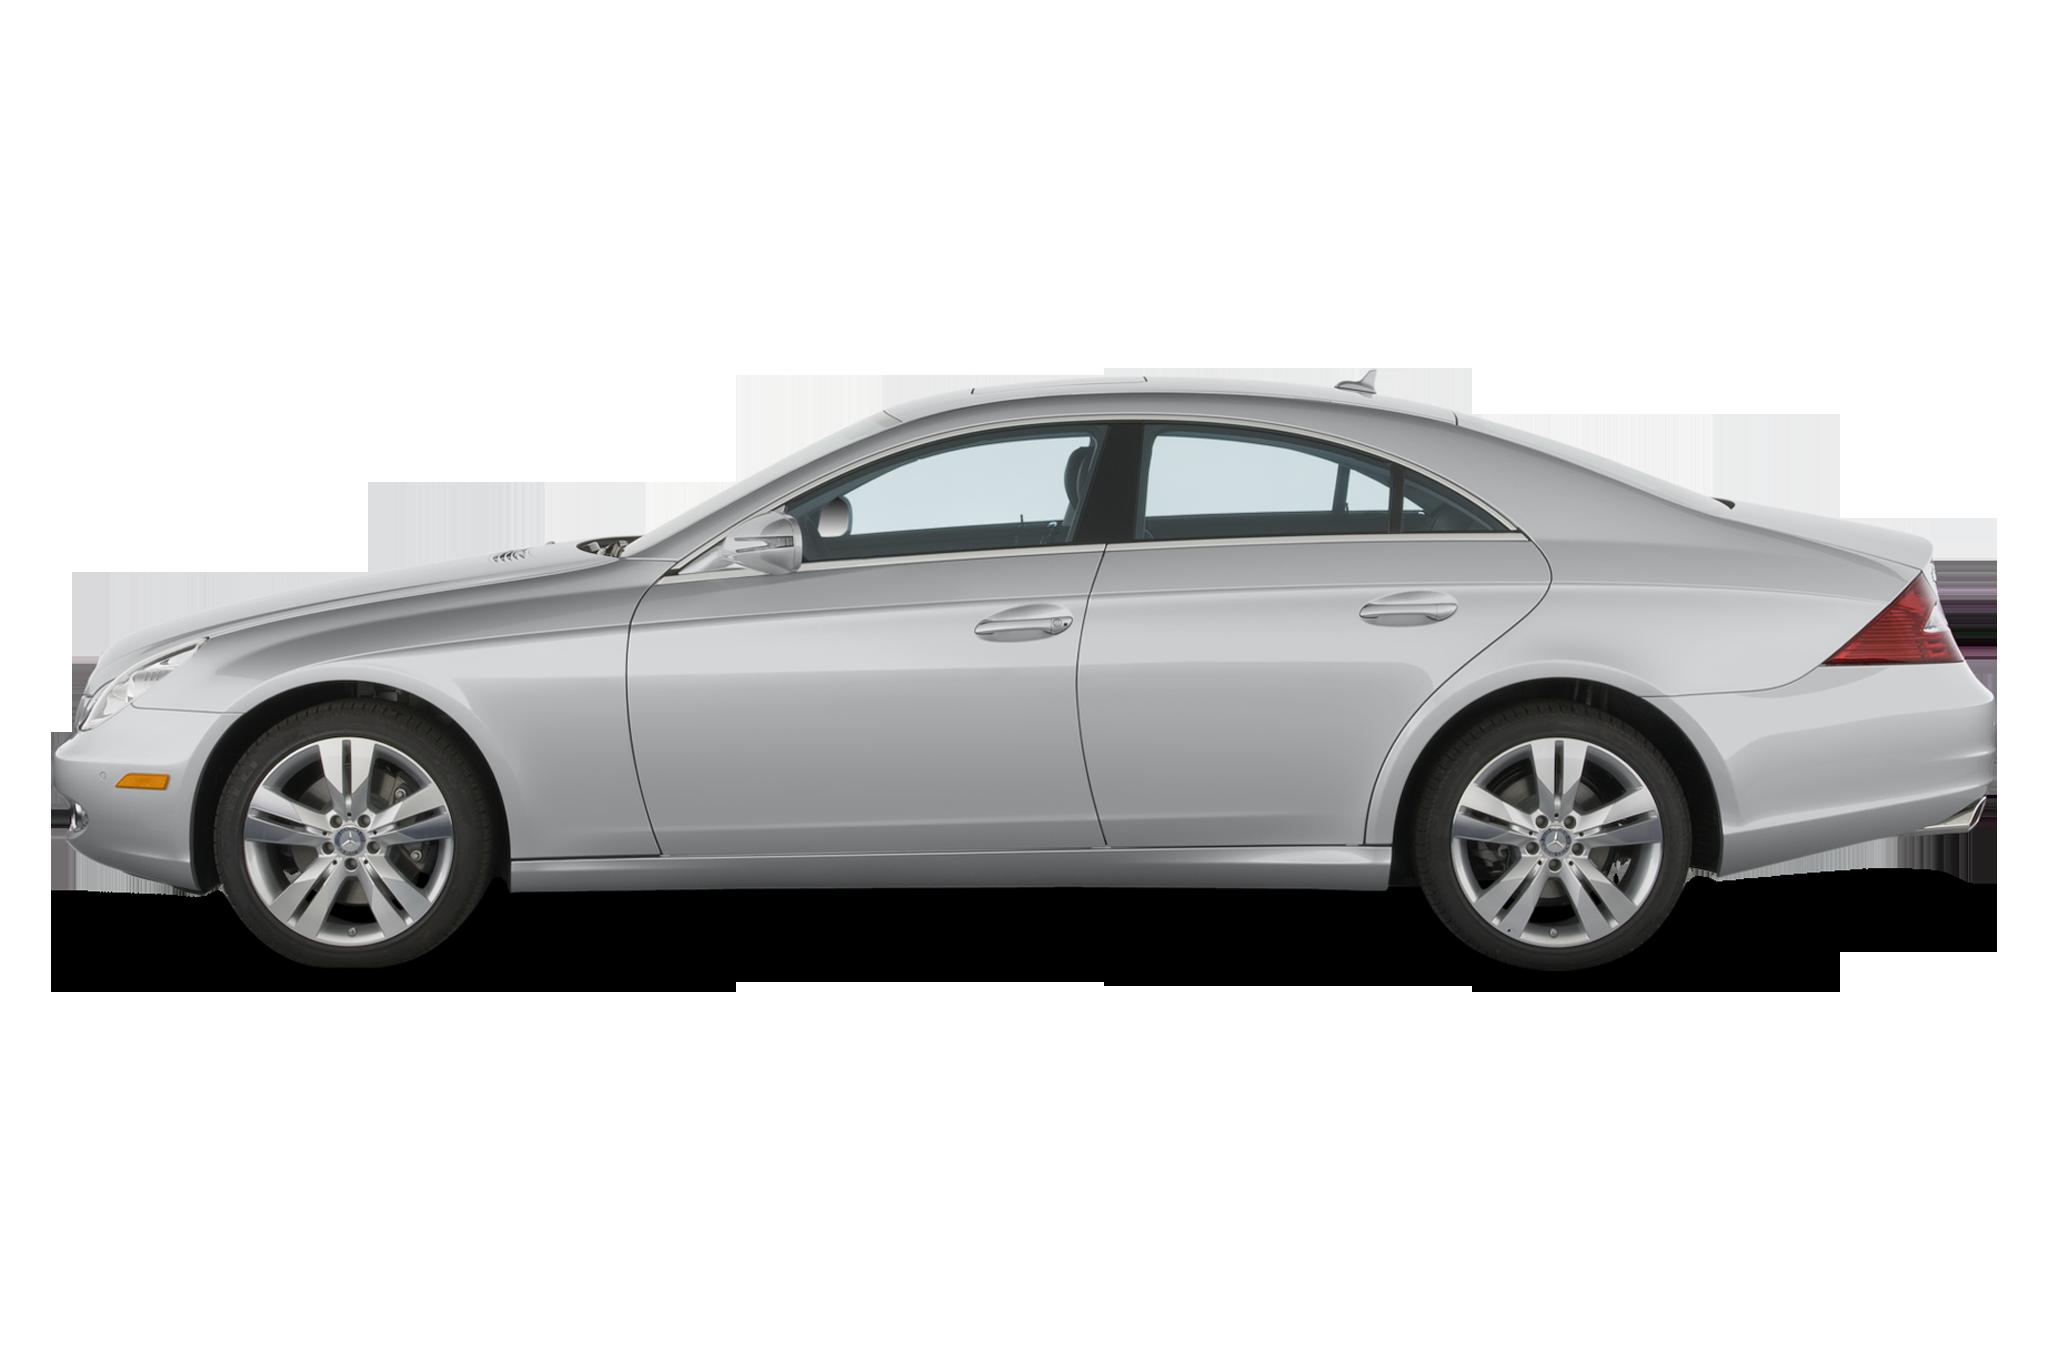 Mercedes Benz Cls Class Msrp